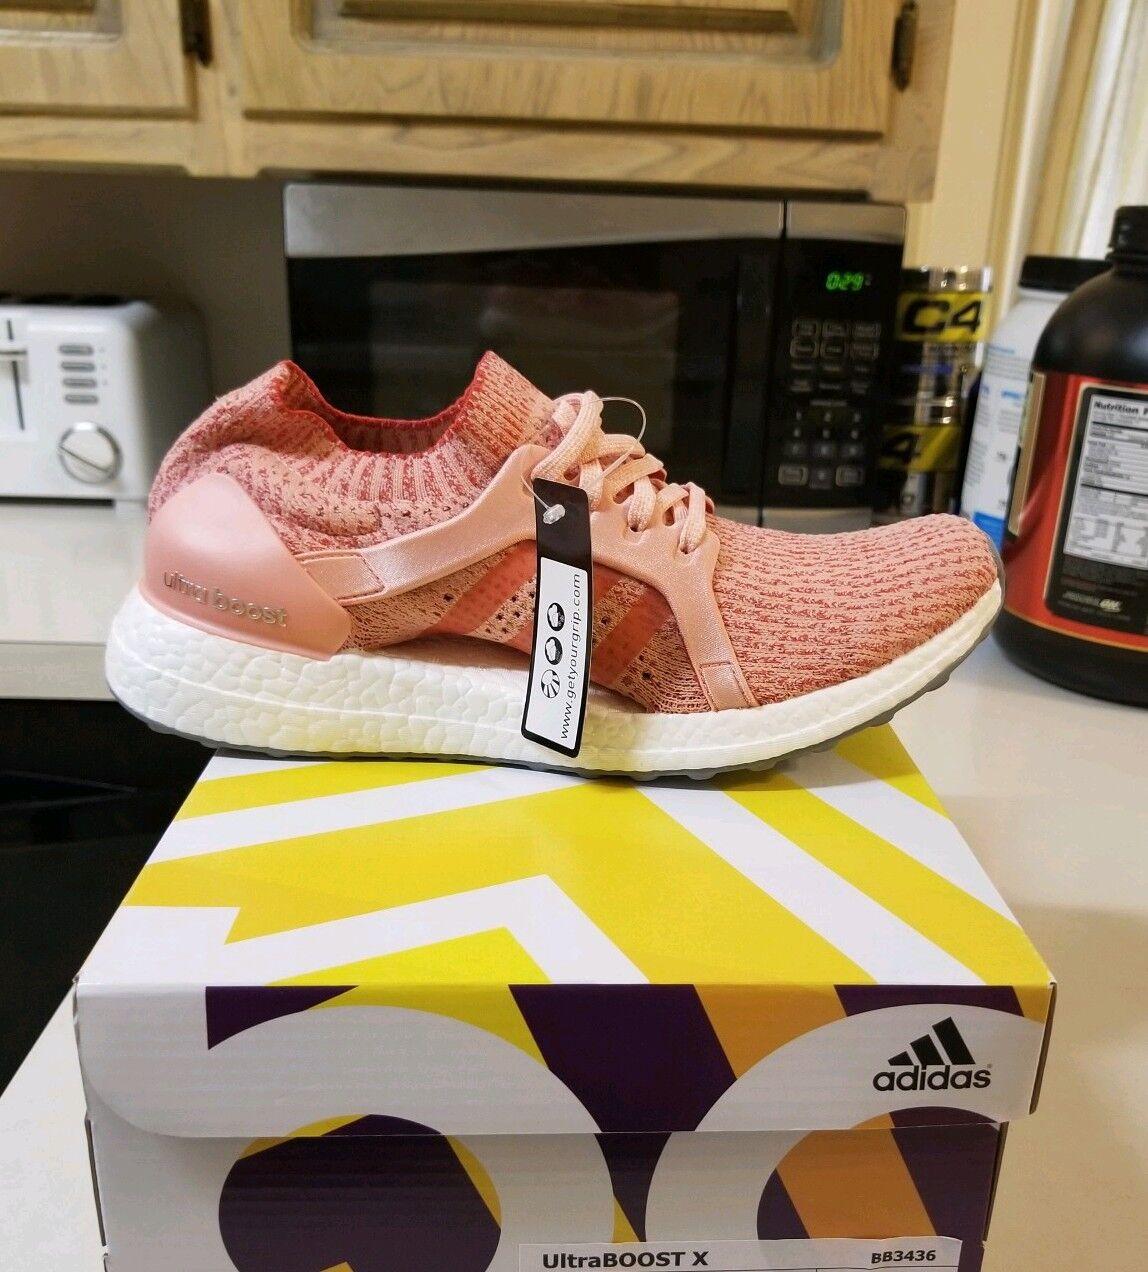 New Women's Adidas 9.5 Ultra Boost X shoes Running Training Pink Ultraboost